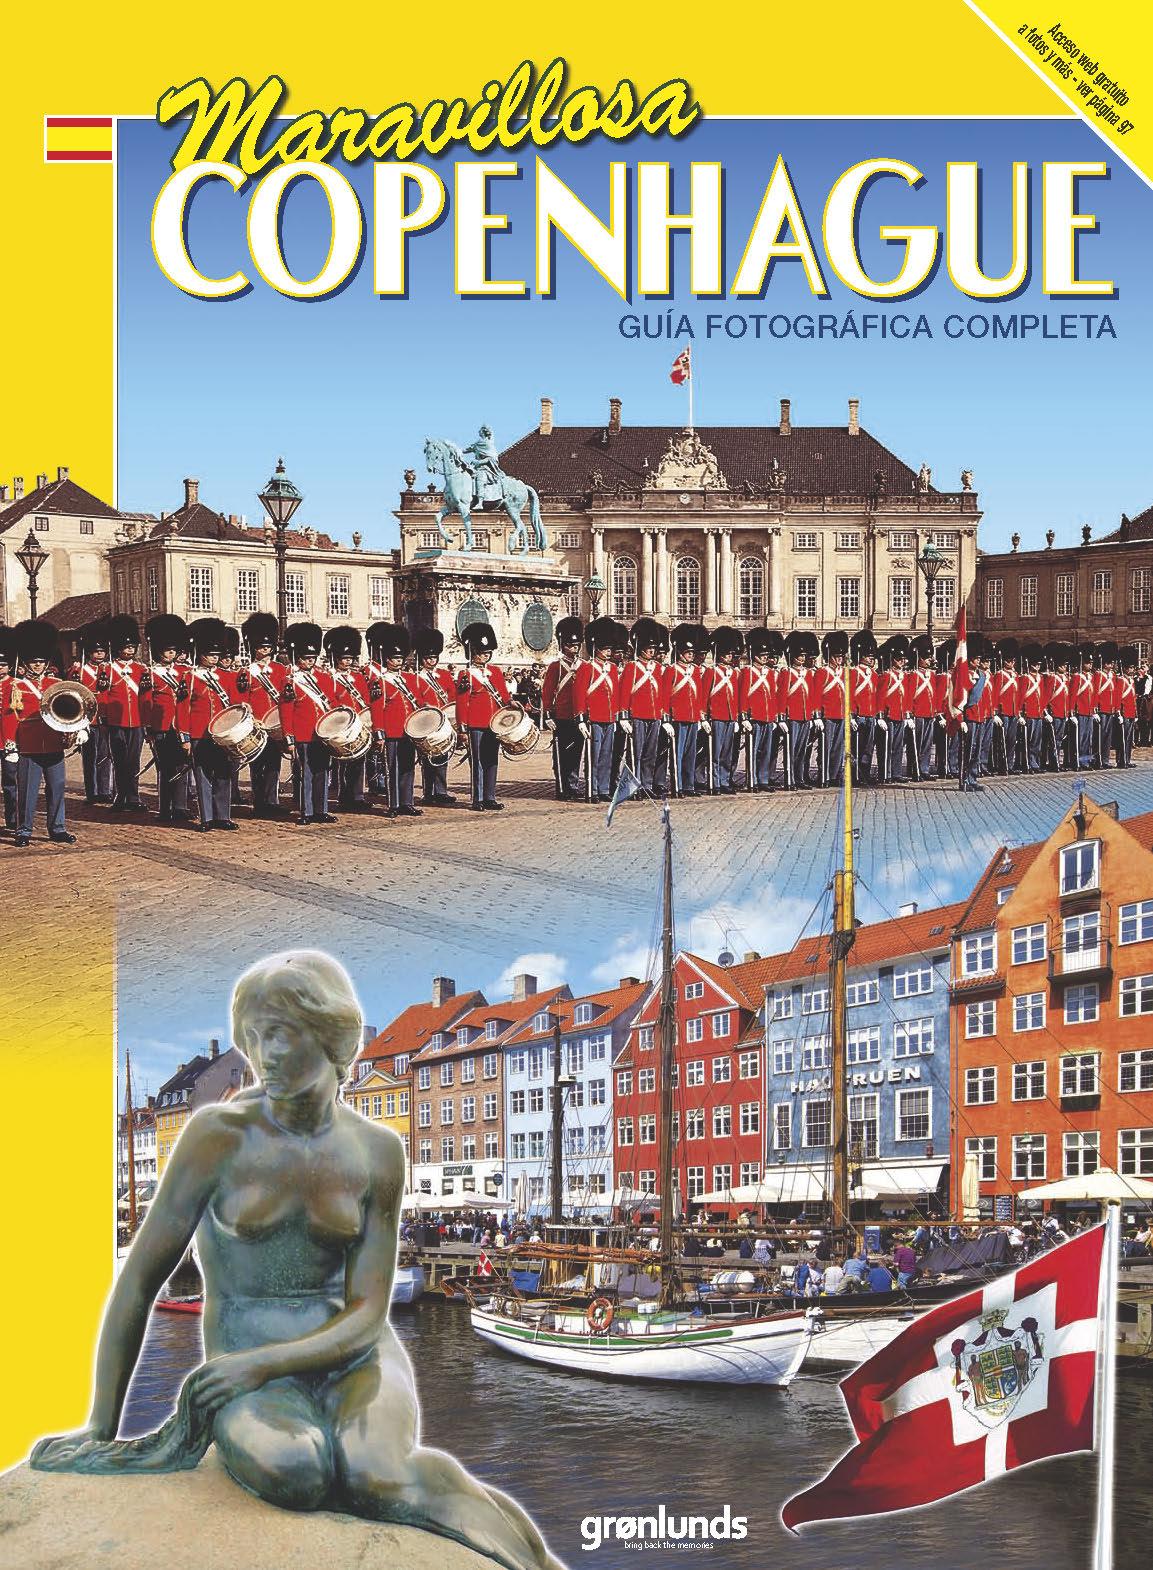 Maravillosa Copenhague, Spansk (2014)